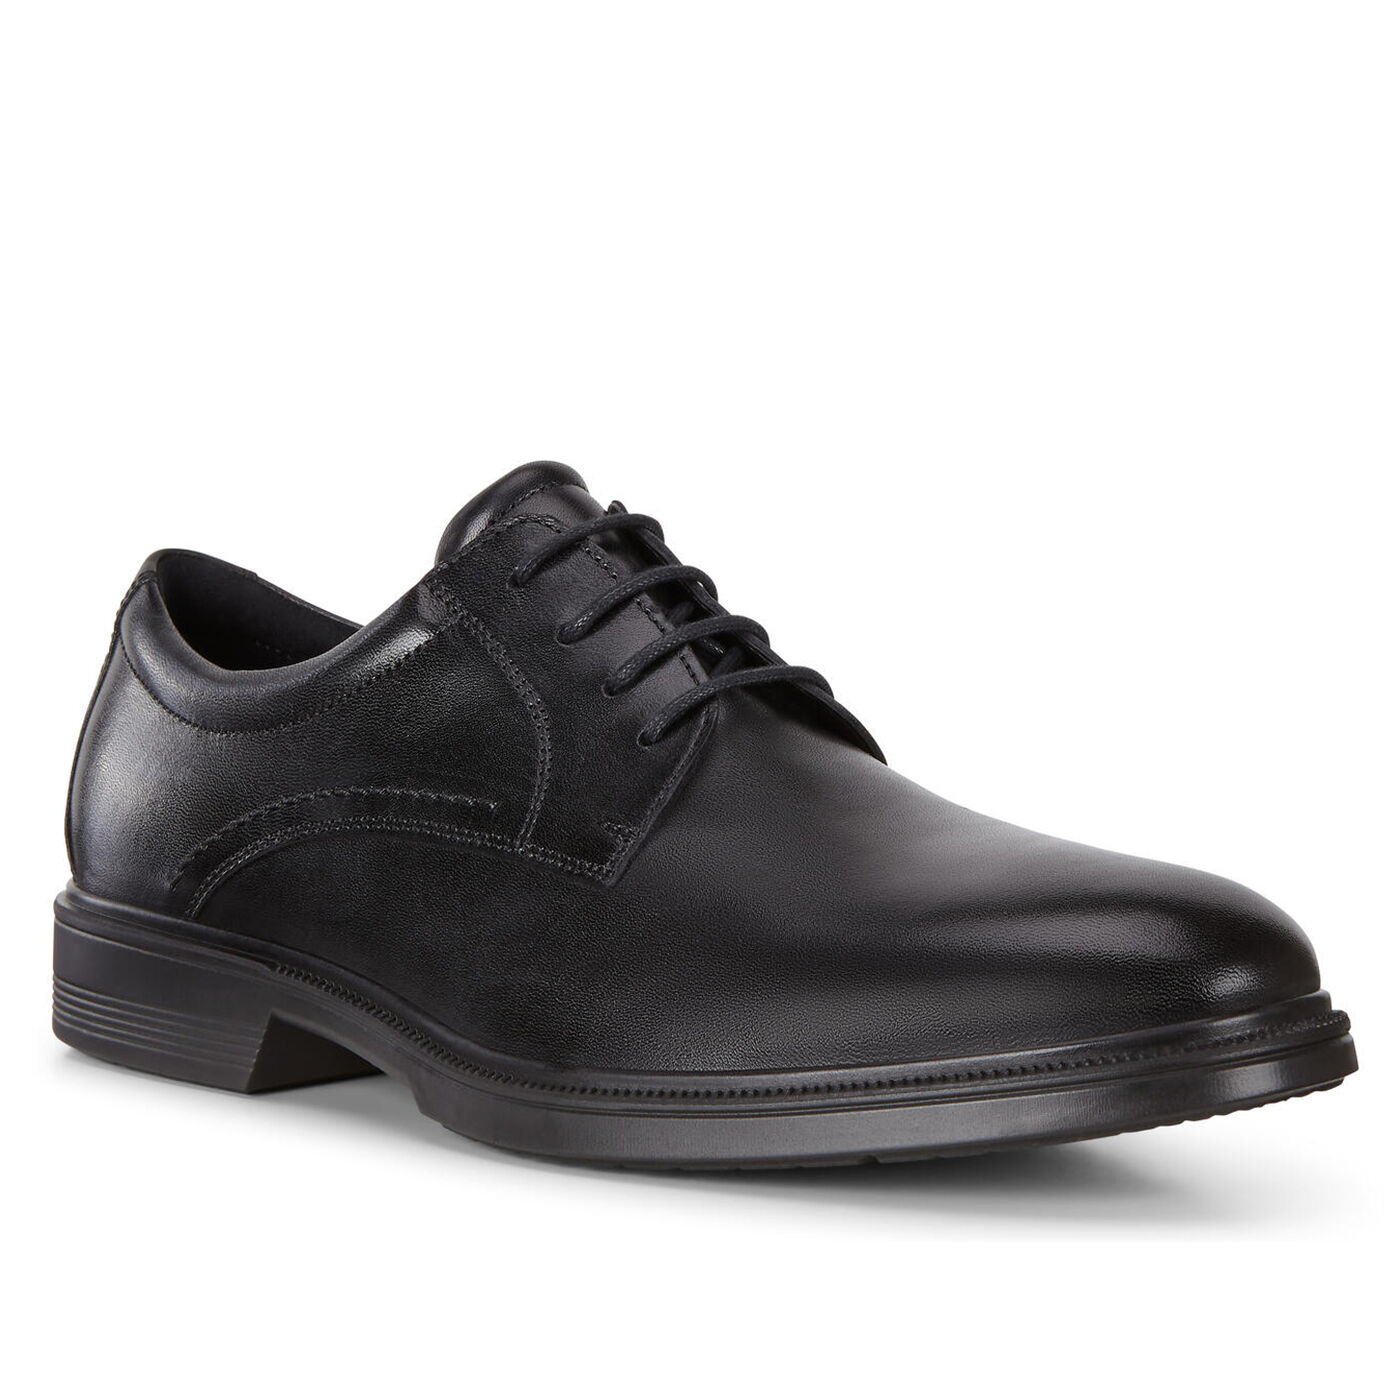 ECCO Maitland Mens Derby Dress Shoe